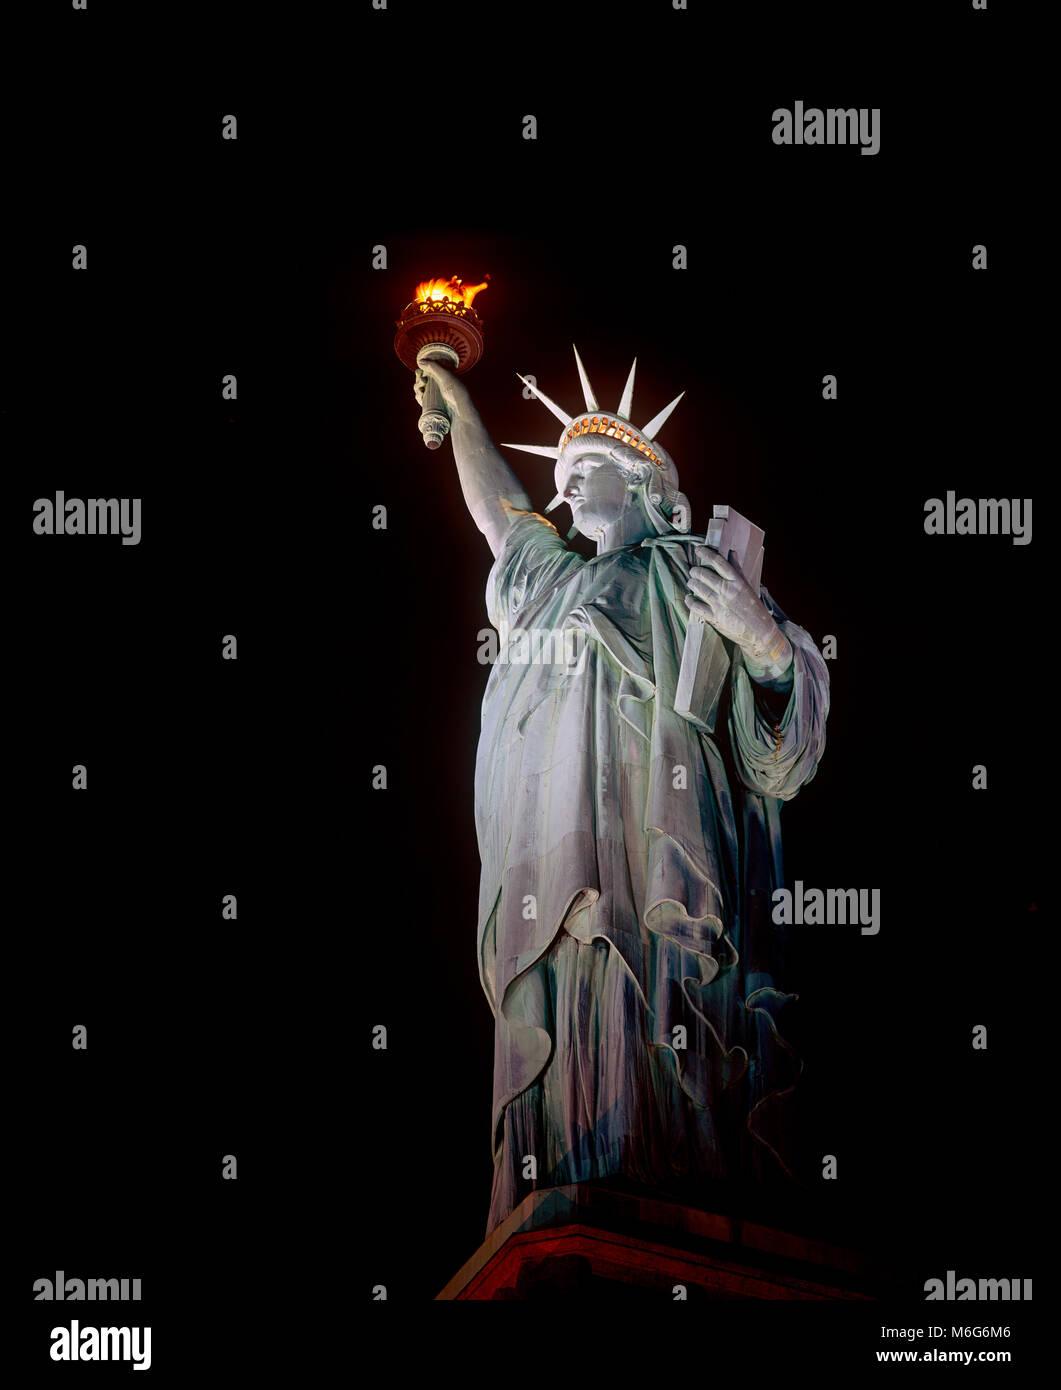 Freiheitsstatue bei Nacht, New York Stockbild